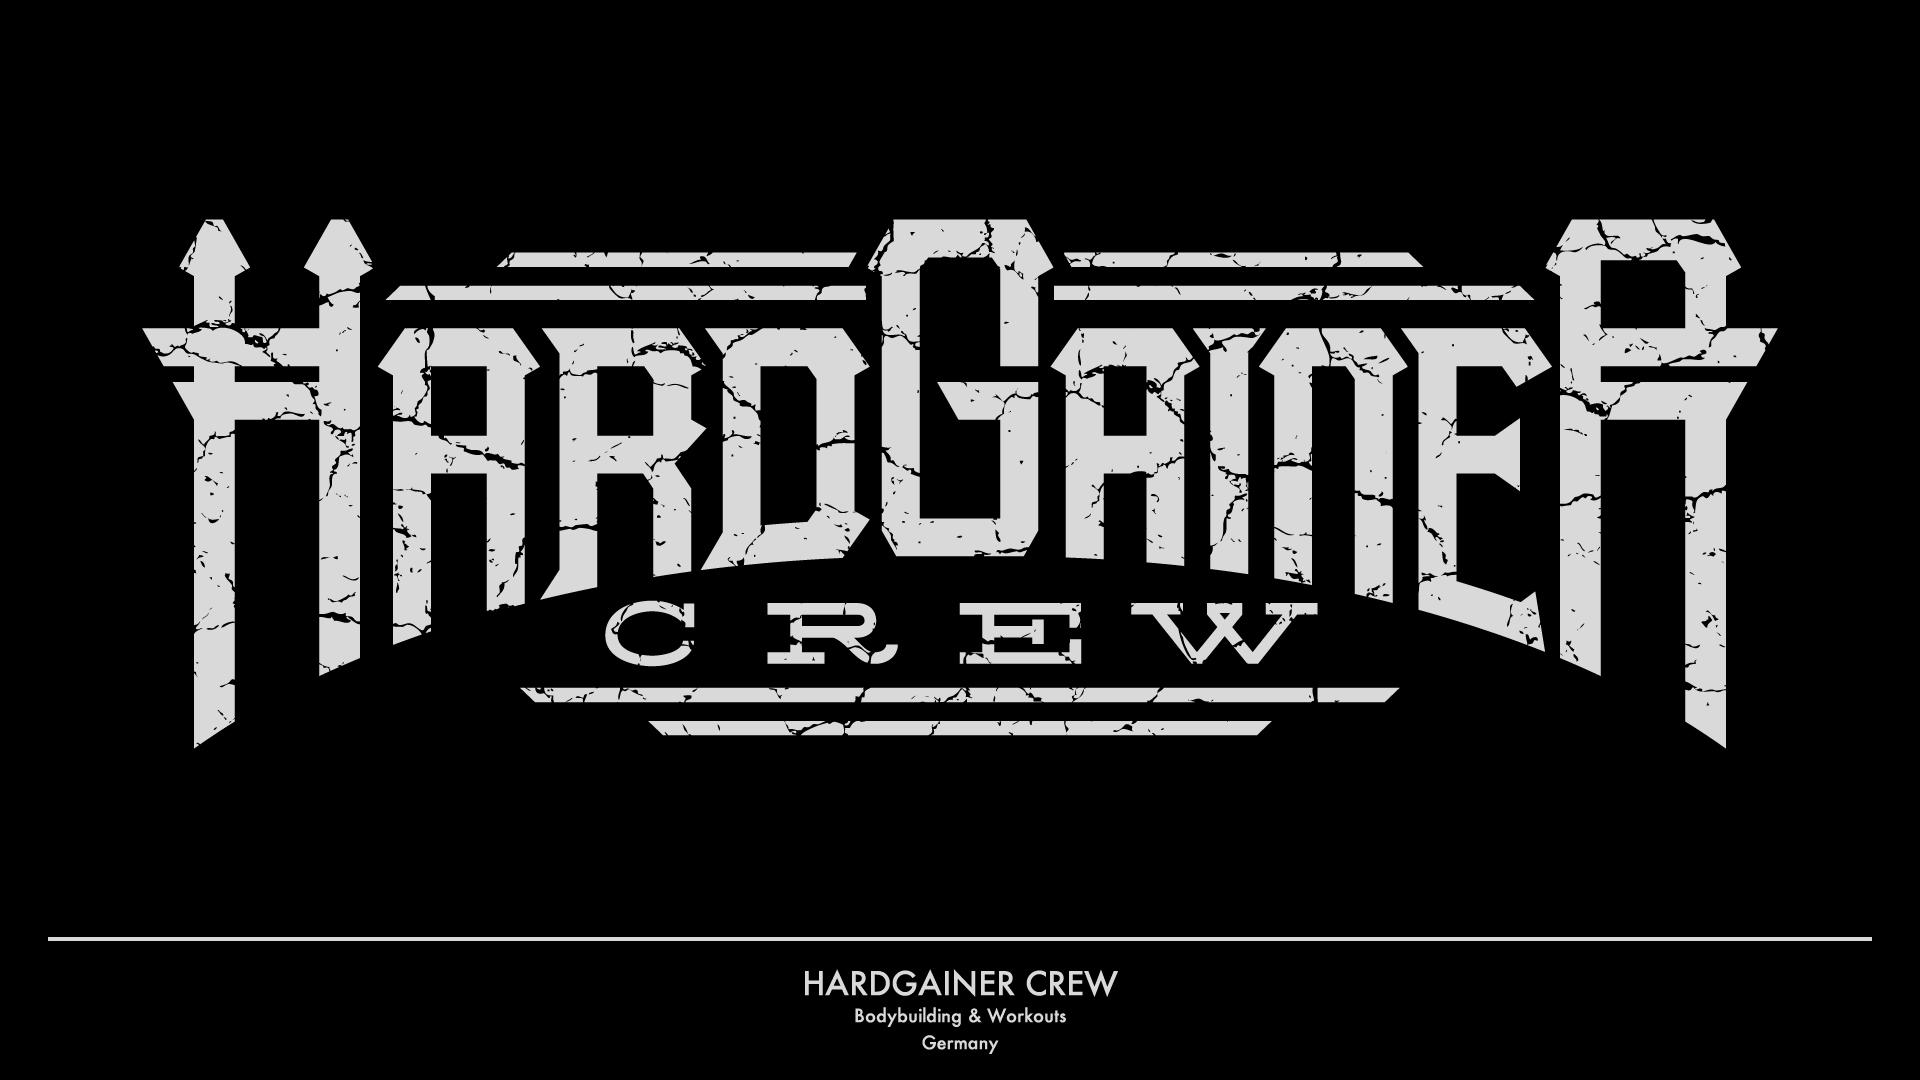 Hardgainer_Crew.jpg